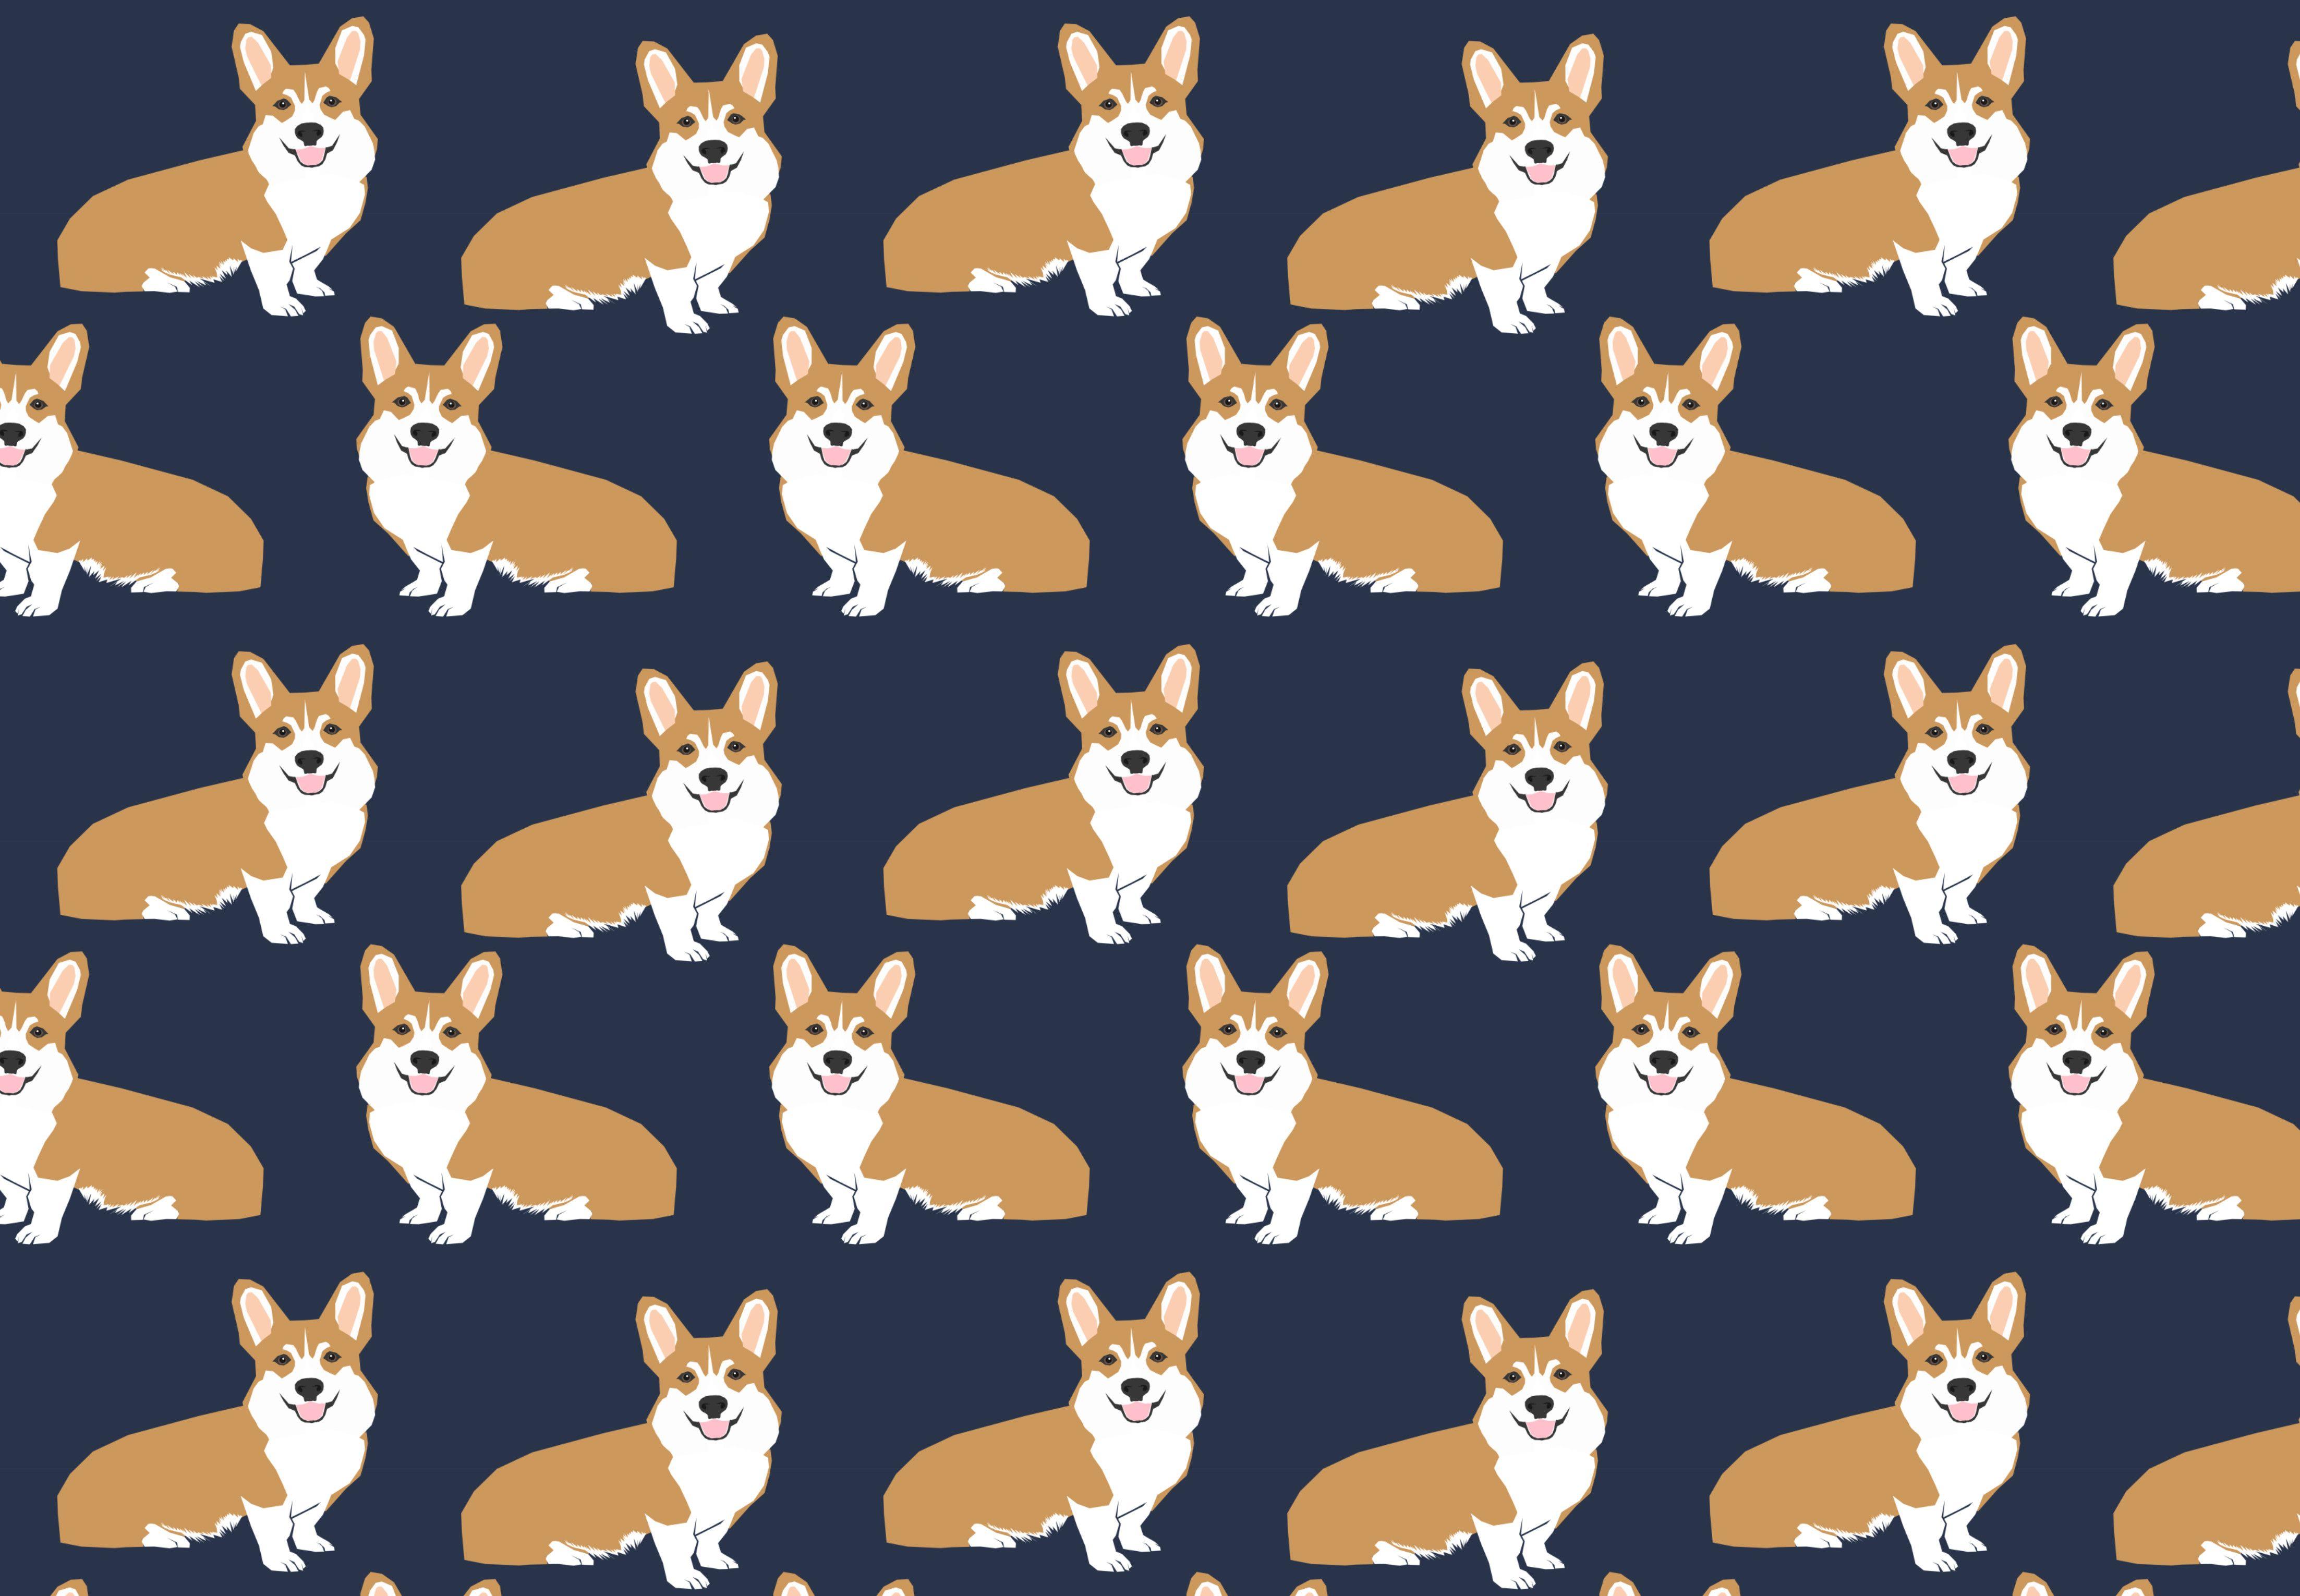 2b7e51875f2b #Casetify #iPhone #Art #Design #Animals #Illustration #ideas #wallpaper # cute #corgi